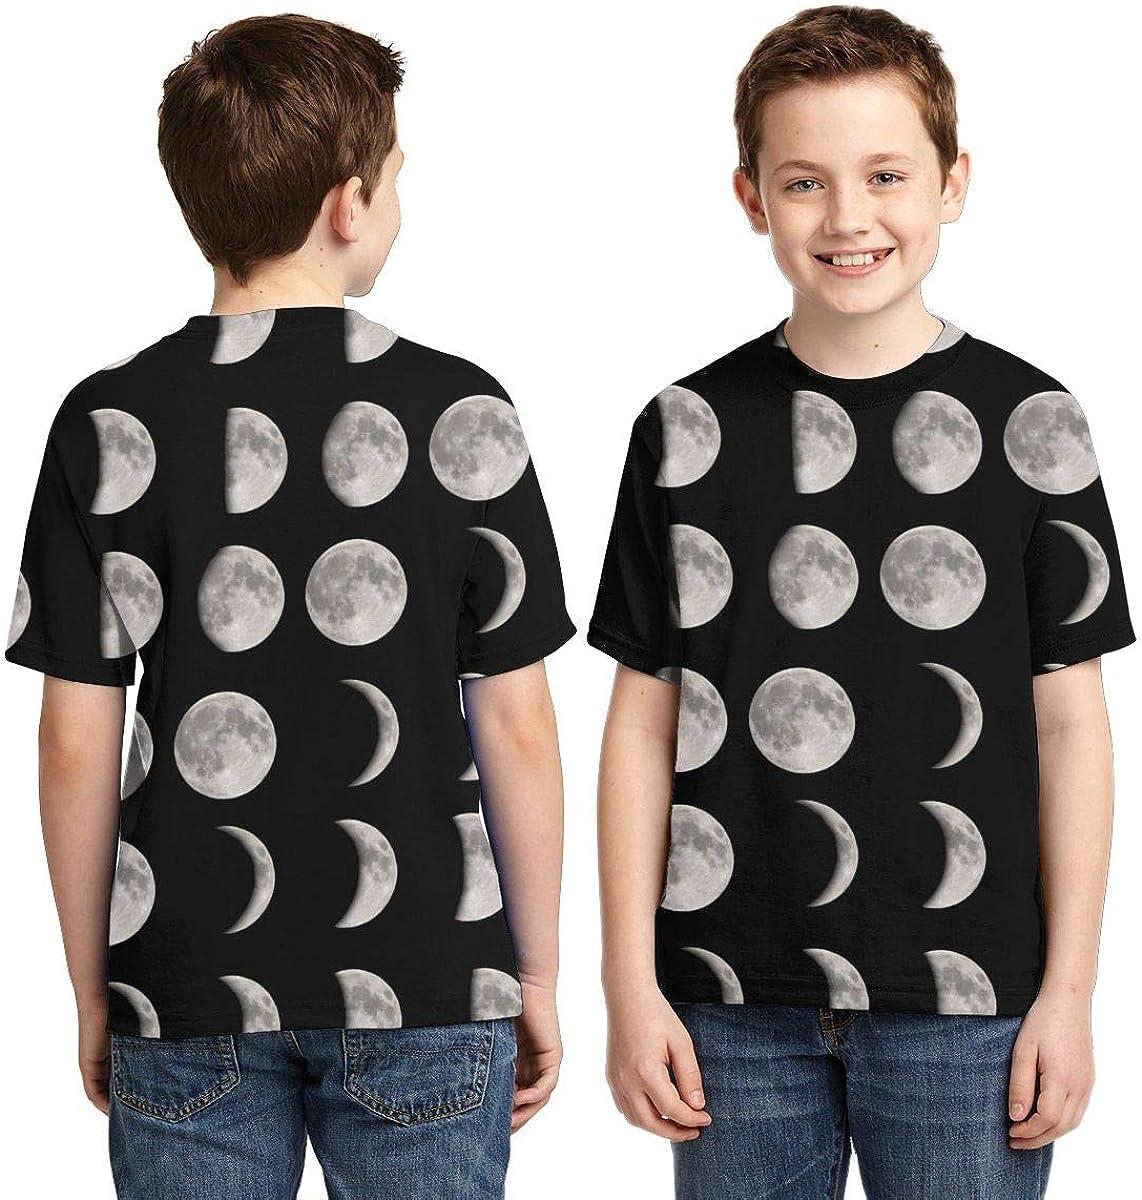 HHTZTCL Moon Phases Kids Print Graphic Tee Short Sleeve T-Shirt